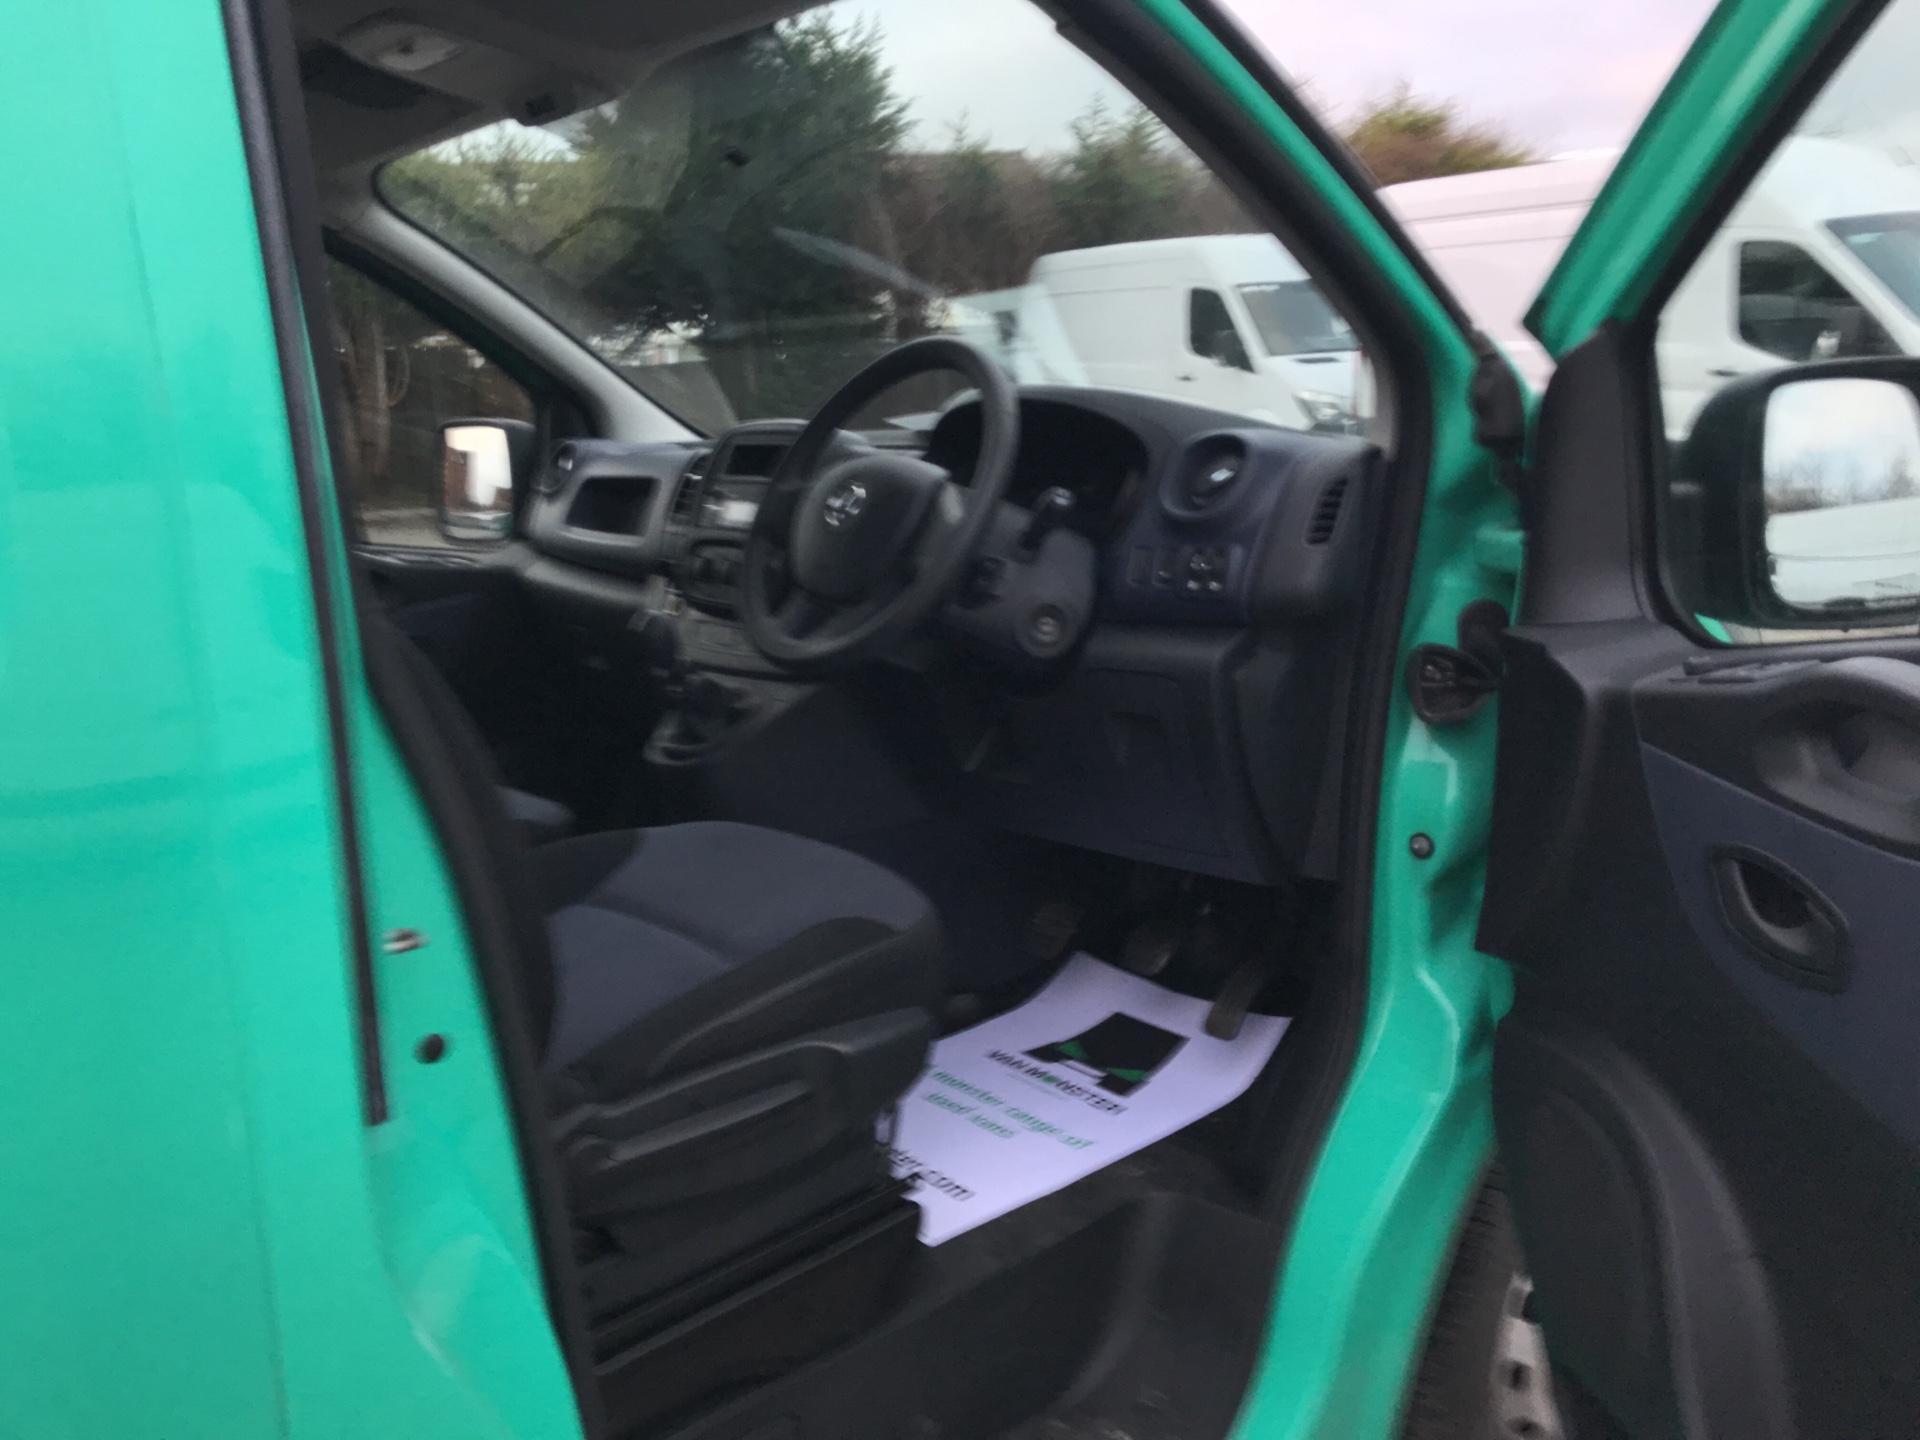 2017 Vauxhall Vivaro L2 H1 2900 1.6CDTI 95PS EURO 6 *VALUE RANGE VEHICLE CONDITION REFLECTED IN PRICE* (BK17OND) Image 17